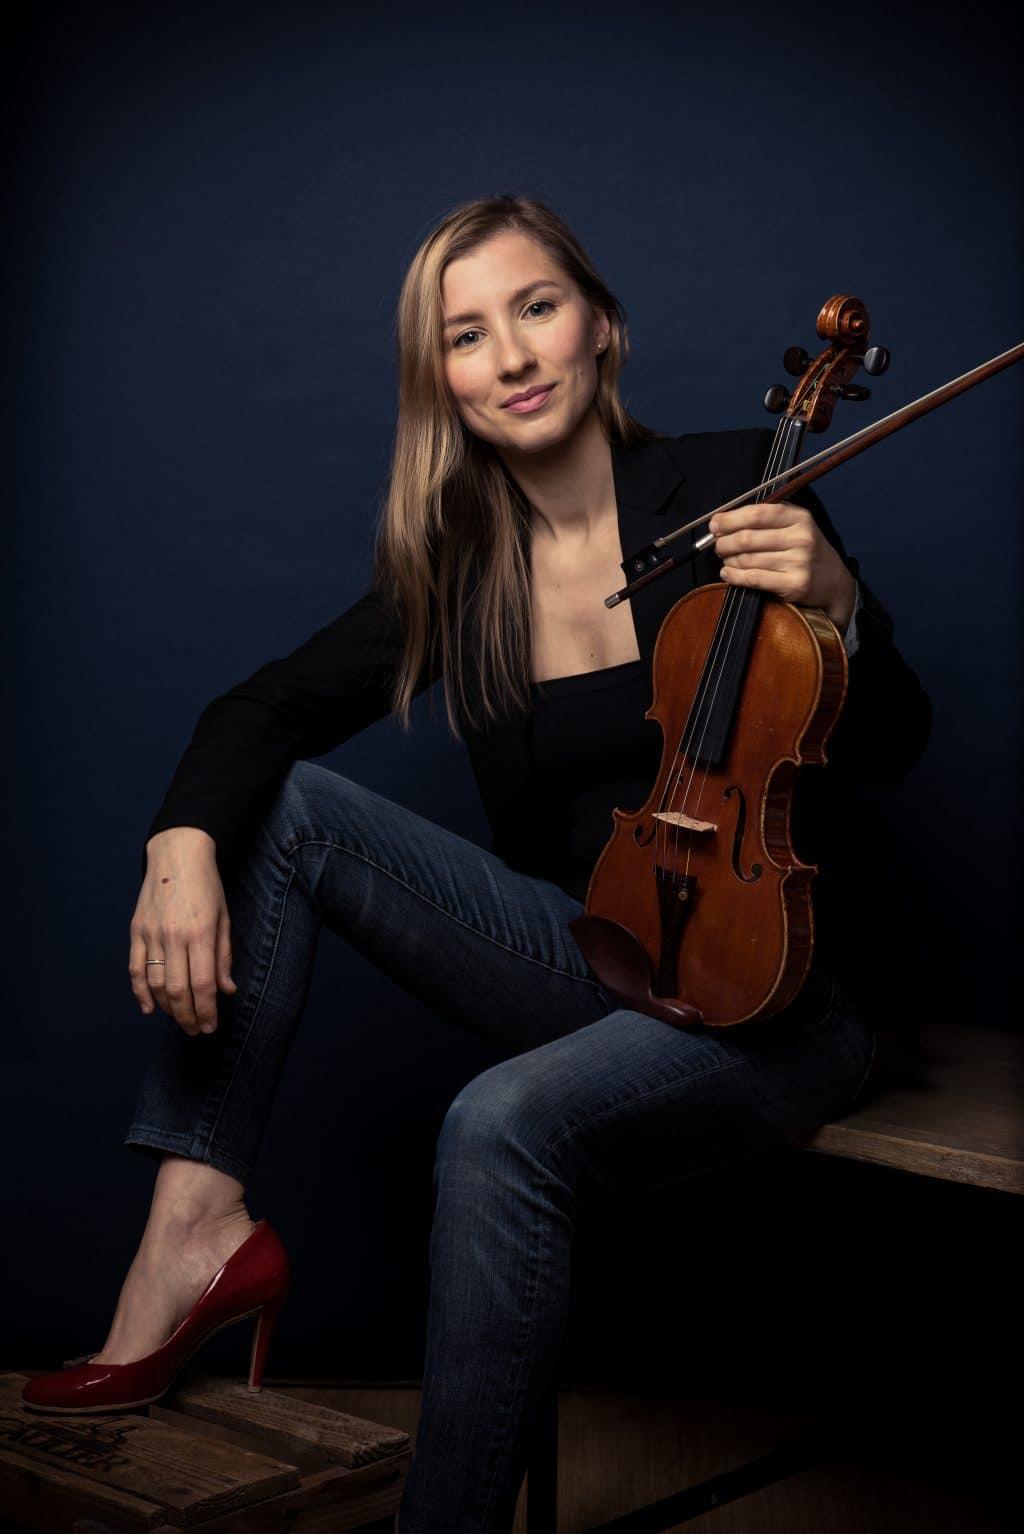 Mathilde Borsarello-Herrman